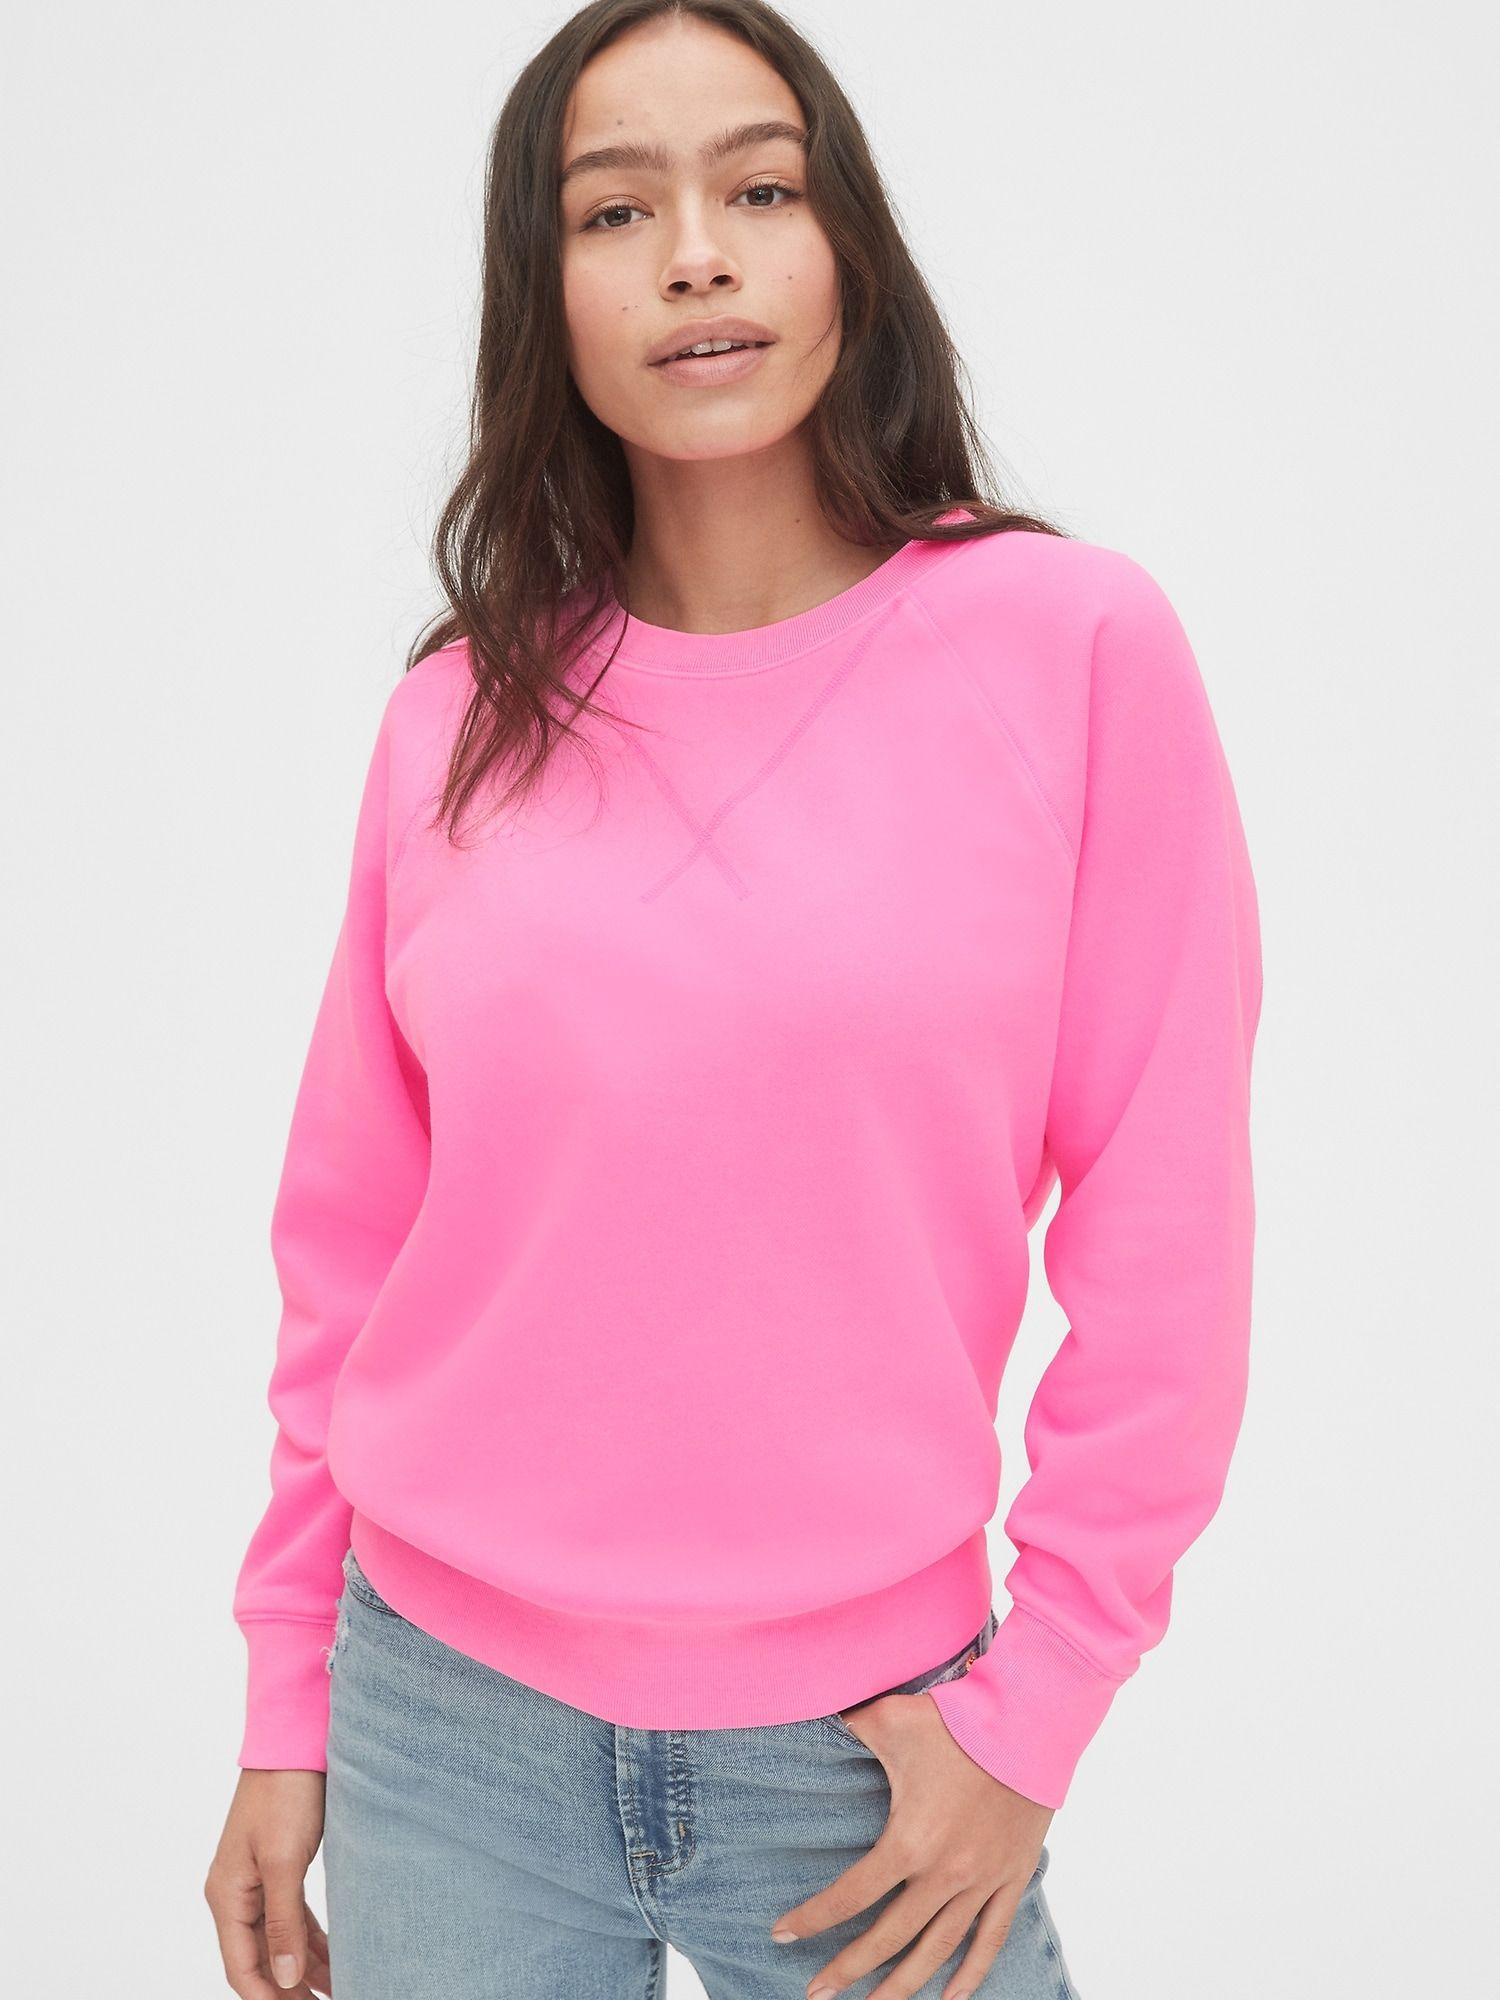 Gap Vintage Soft Crewneck Sweatshirt Sizzling Fucshia Pink Neon Women Long Sleeve Tops Soft Sweatshirts Pink Crewneck [ 2000 x 1500 Pixel ]